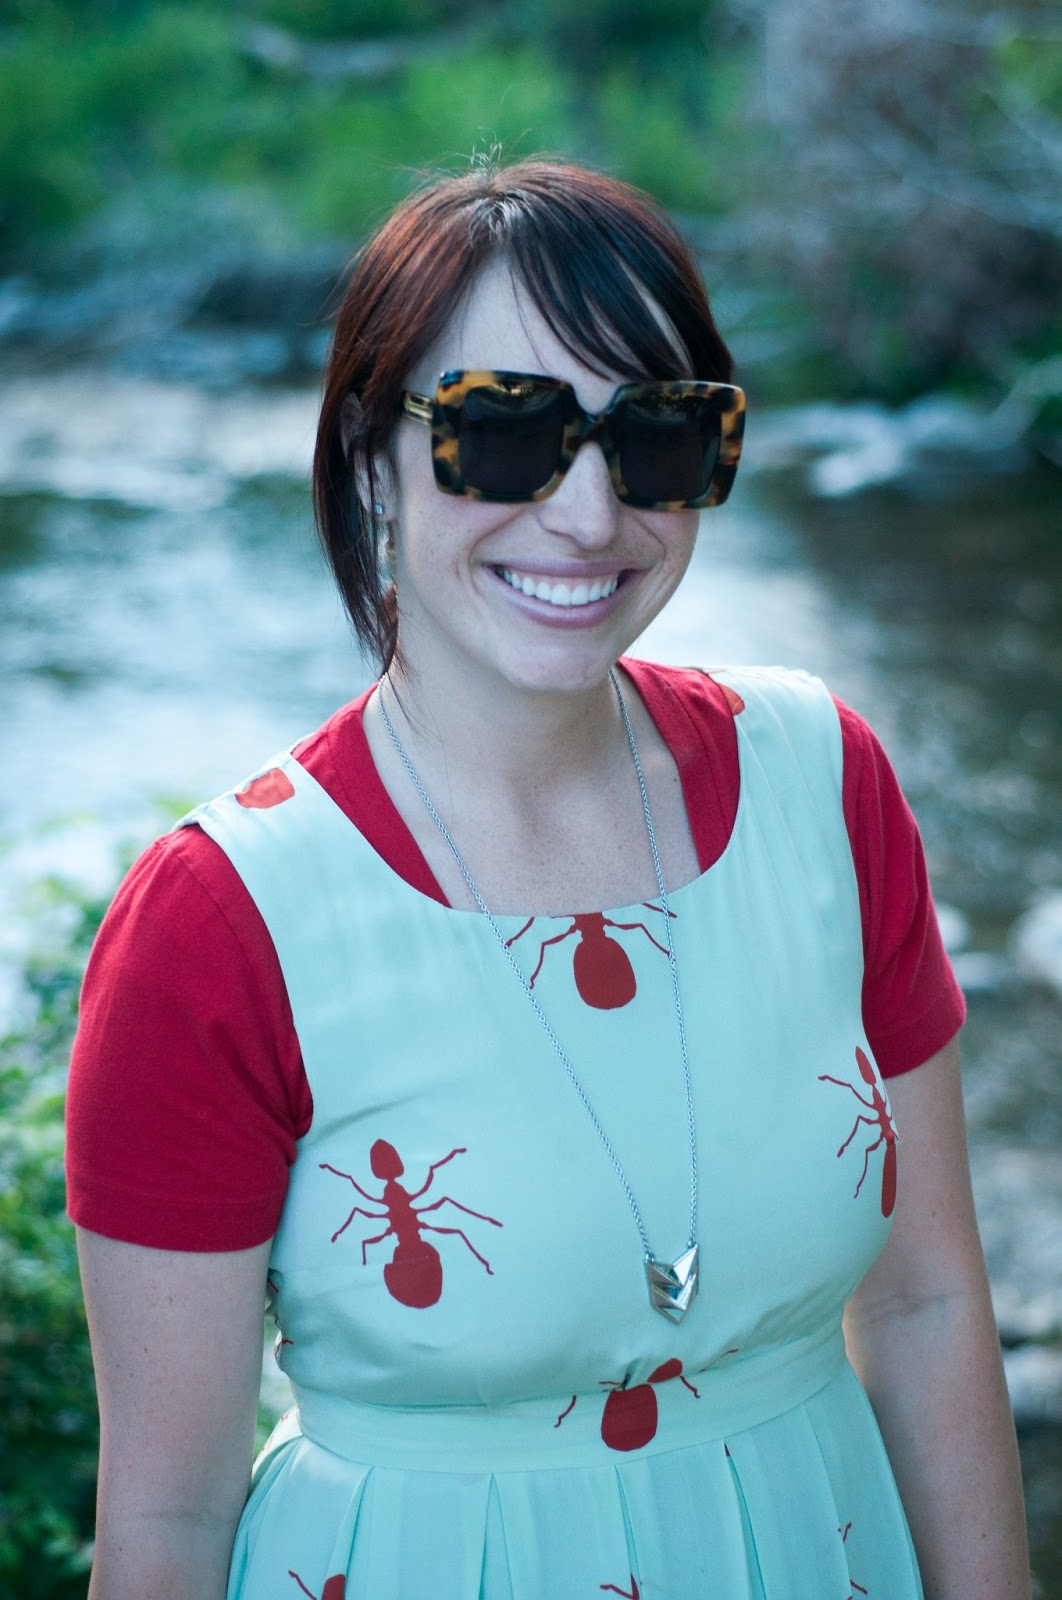 style blog, fashion blog, karen walker sunglasses, charlotte taylor, Rebecca minkoff, ant dress, mint dress, american apparel tee